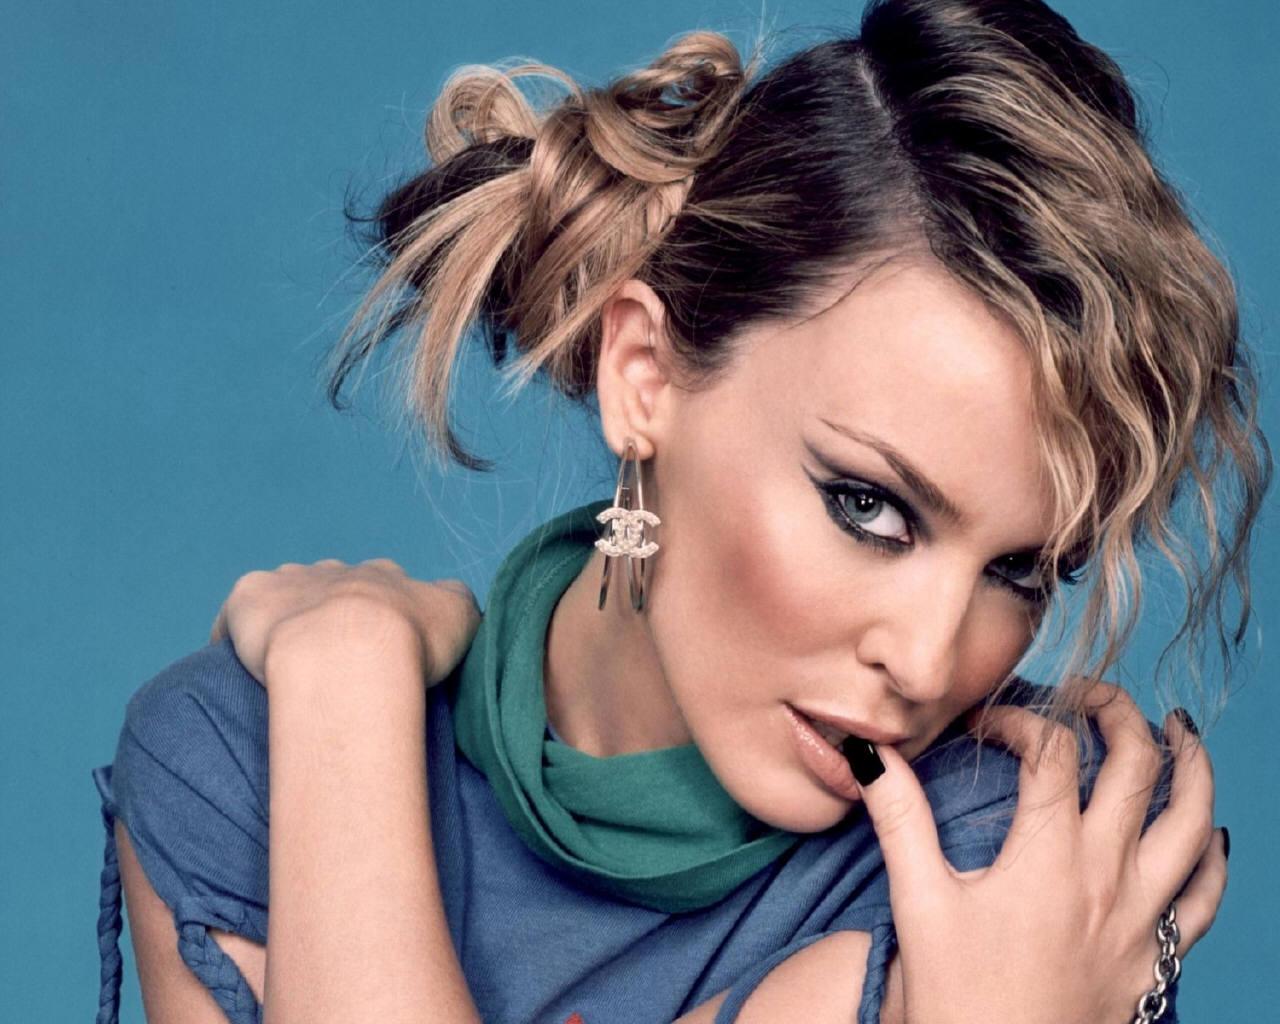 http://1.bp.blogspot.com/_zEpnKbkzNzA/TGGgitQvtzI/AAAAAAAAKDA/FpfGVnetb4g/s1600/Kylie-Minogue-kylie-minogue-64557_1280_1024.jpg